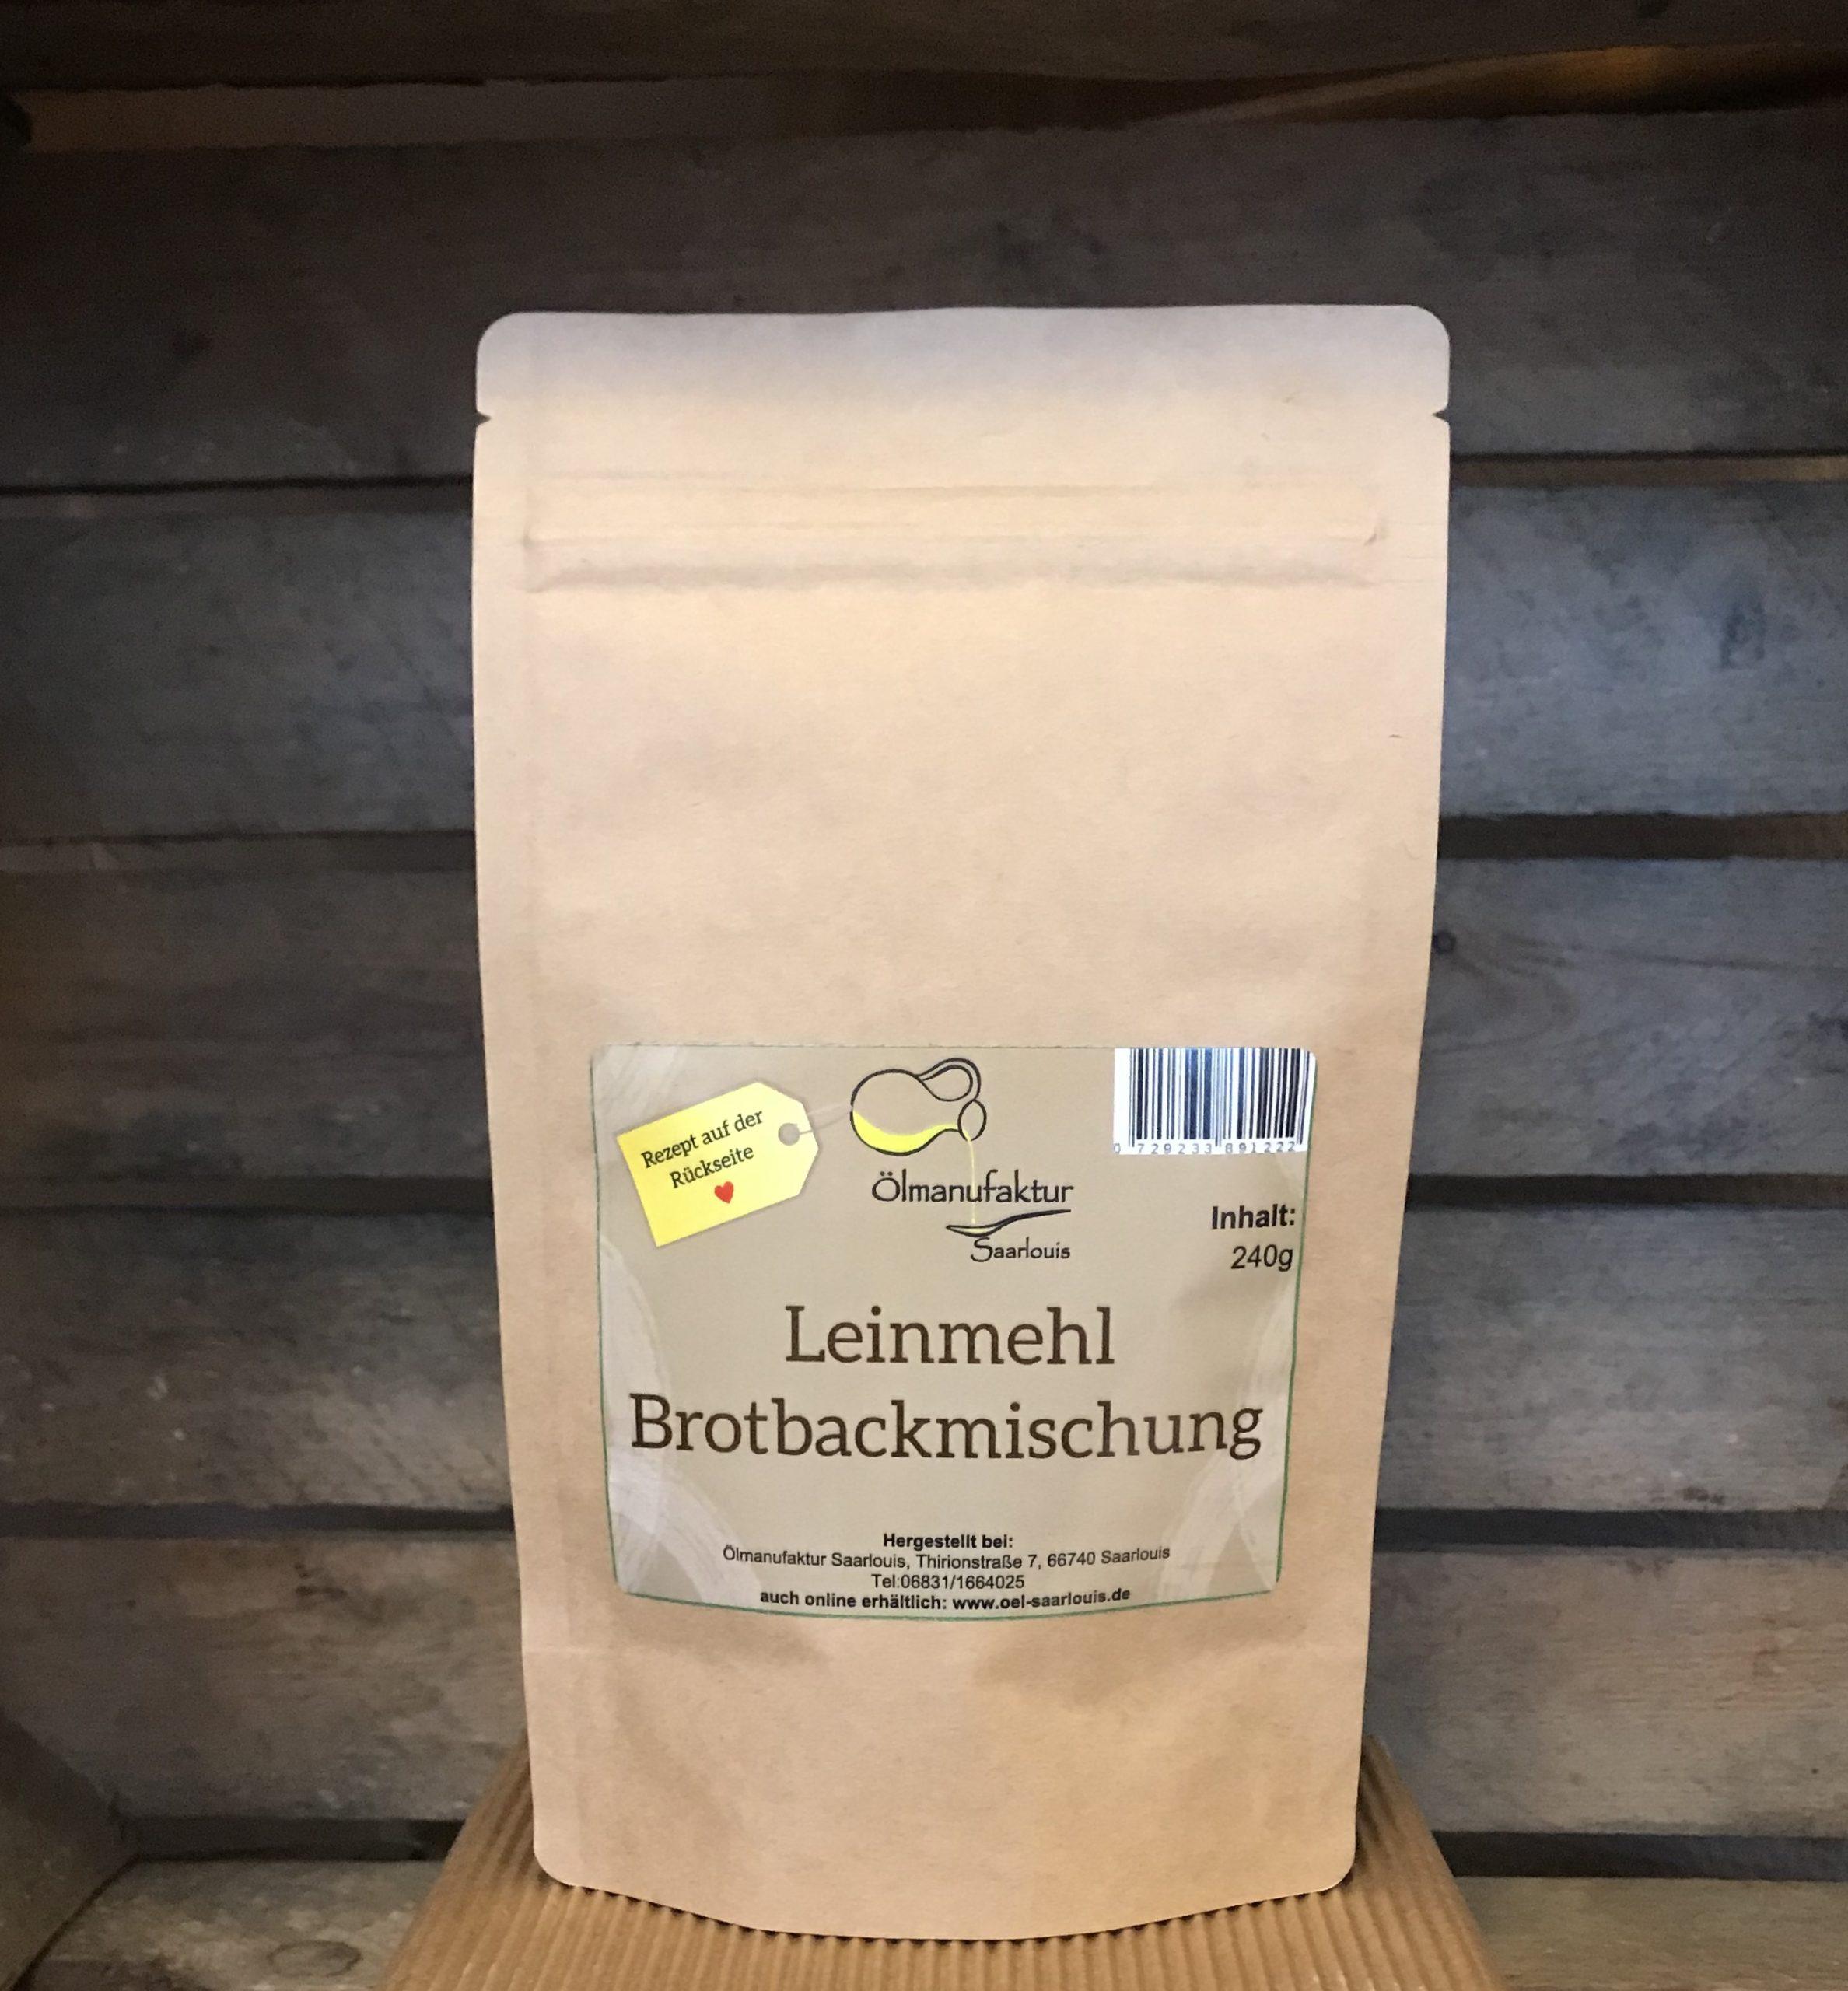 5x Leinmehl Brotbackmischung